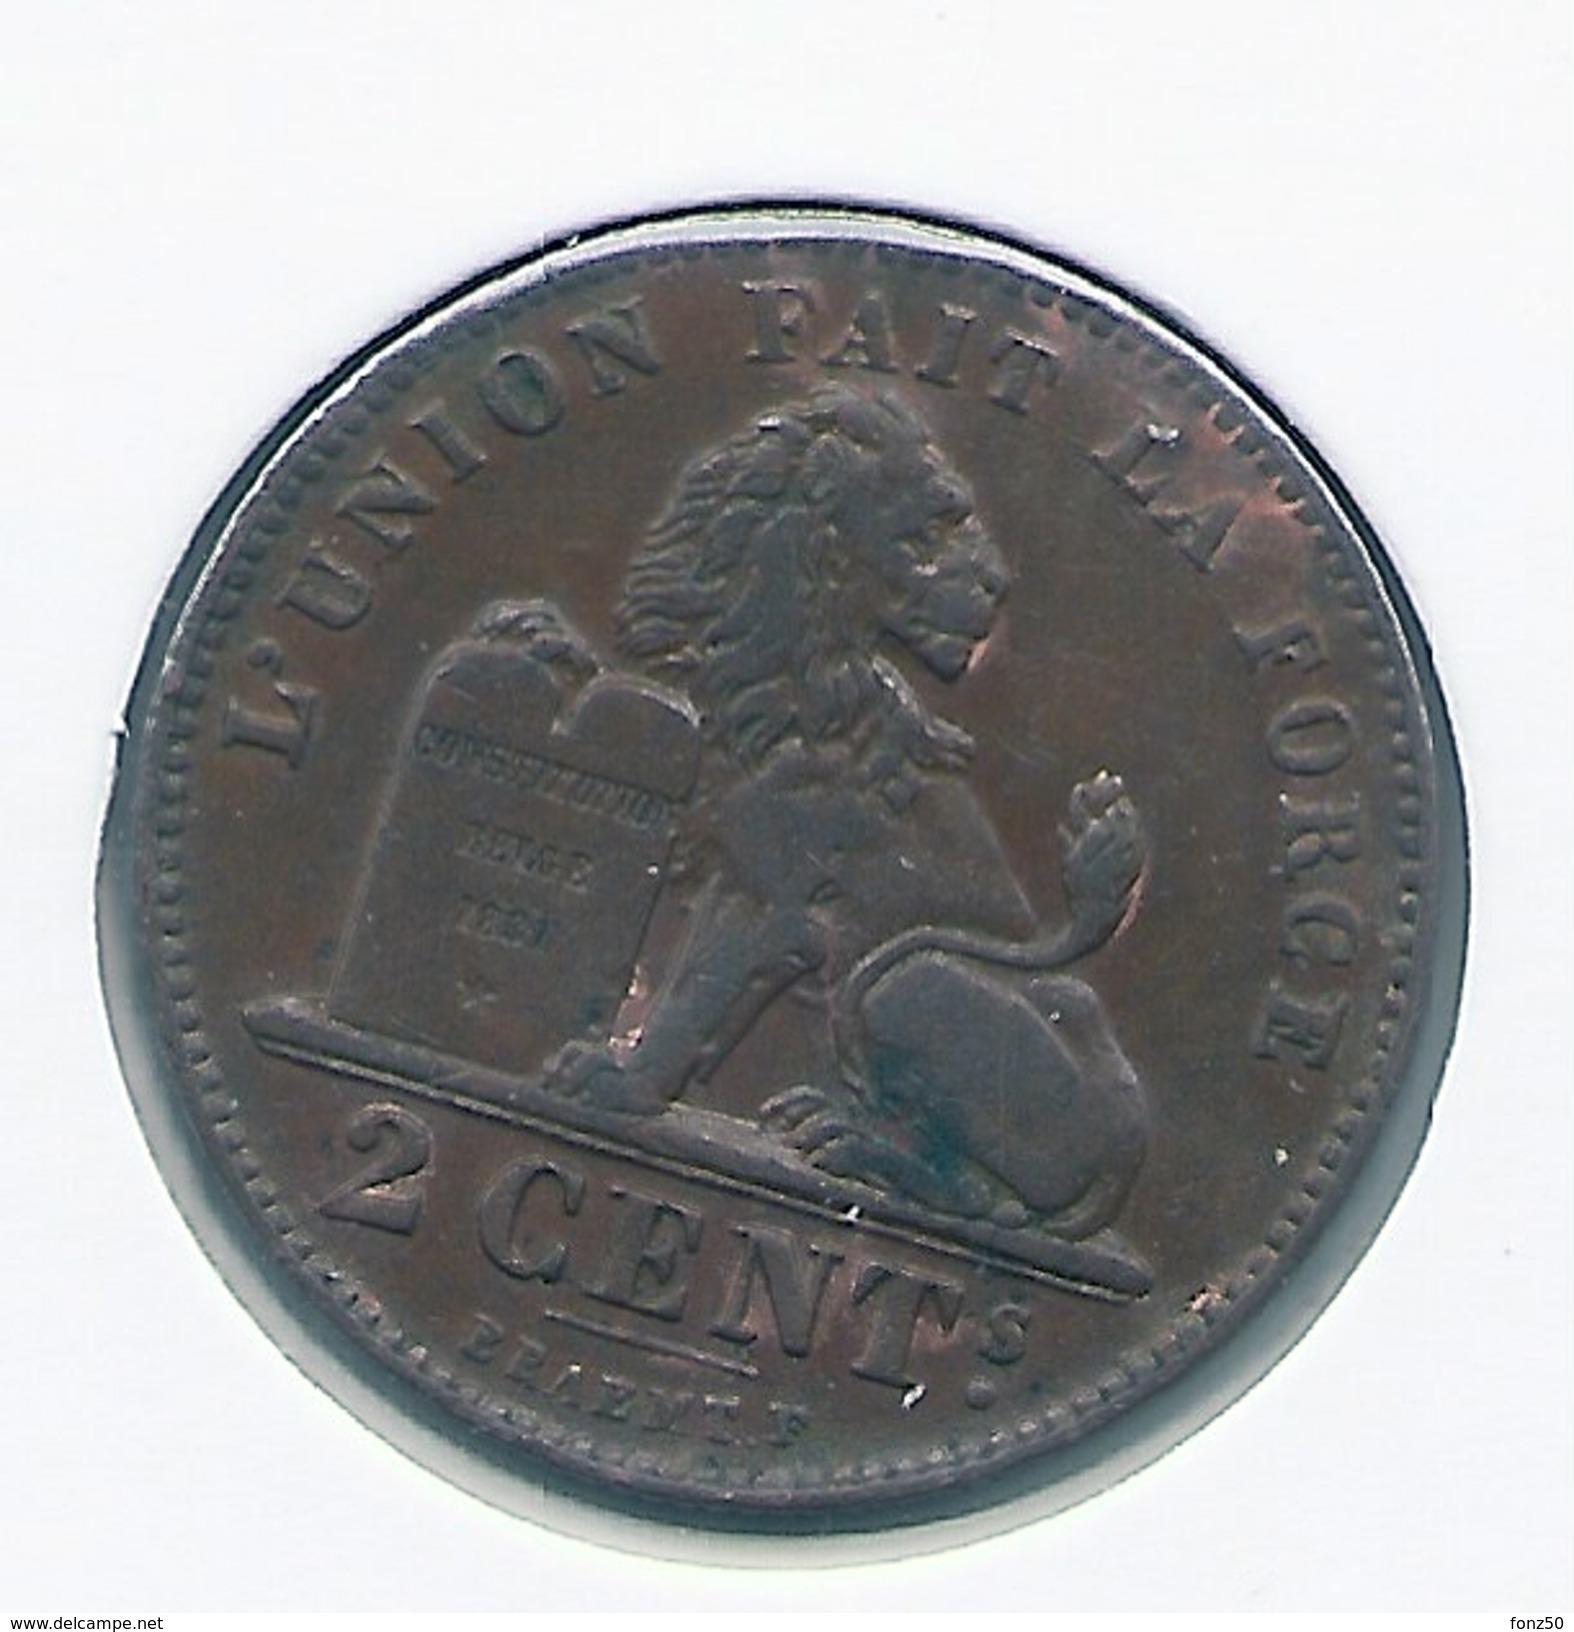 2 Cent 1914 Frans * Prachtig * Nr 7711 - 02. 2 Centimes